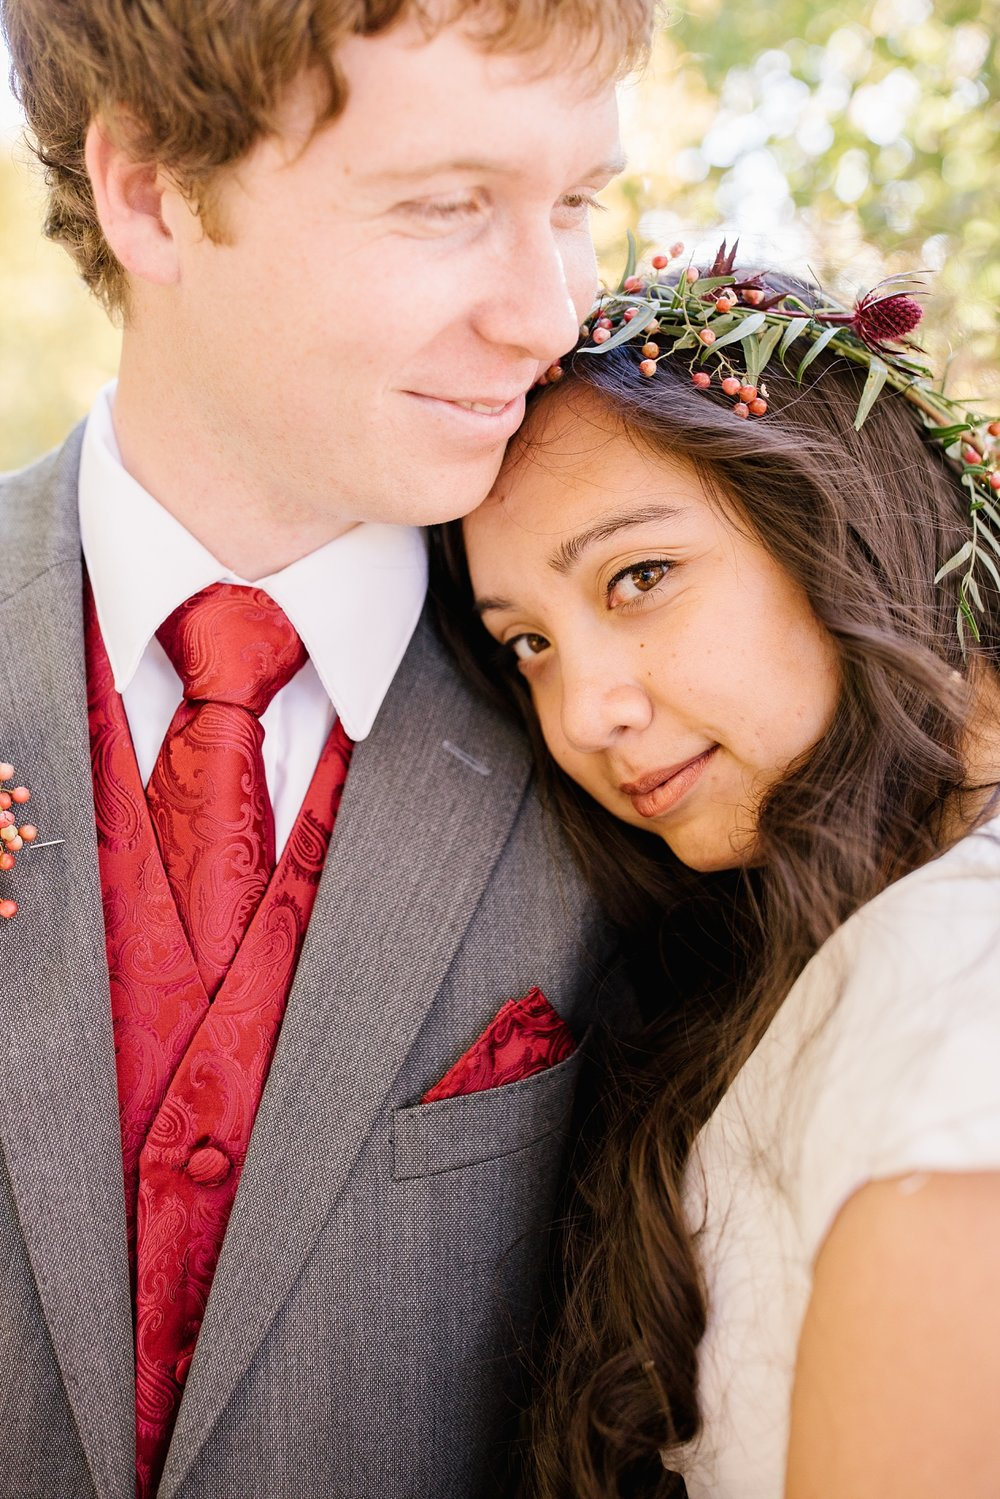 JB-Bridals-66_Lizzie-B-Imagery-Utah-Wedding-Photographer-Thanksgiving-Point-Ashton-Gardens-Lehi-Utah.jpg